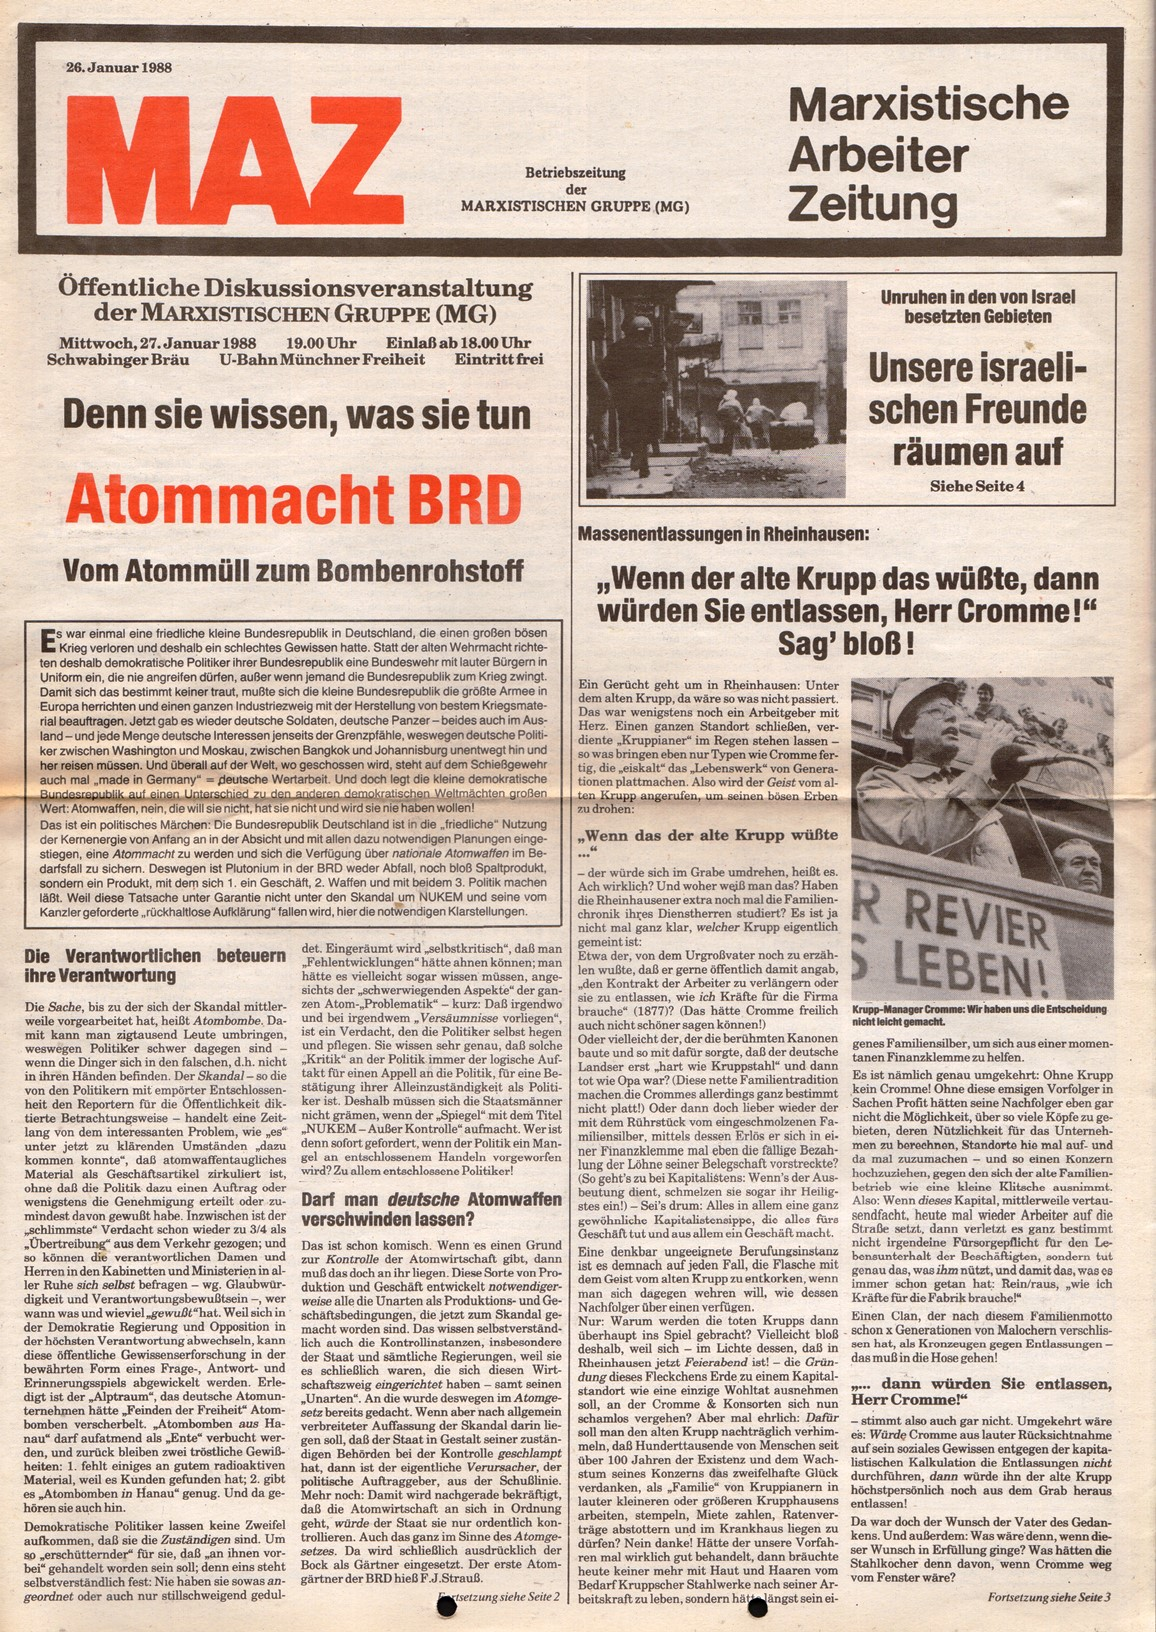 Muenchen_MG_MAZ_19880126_01